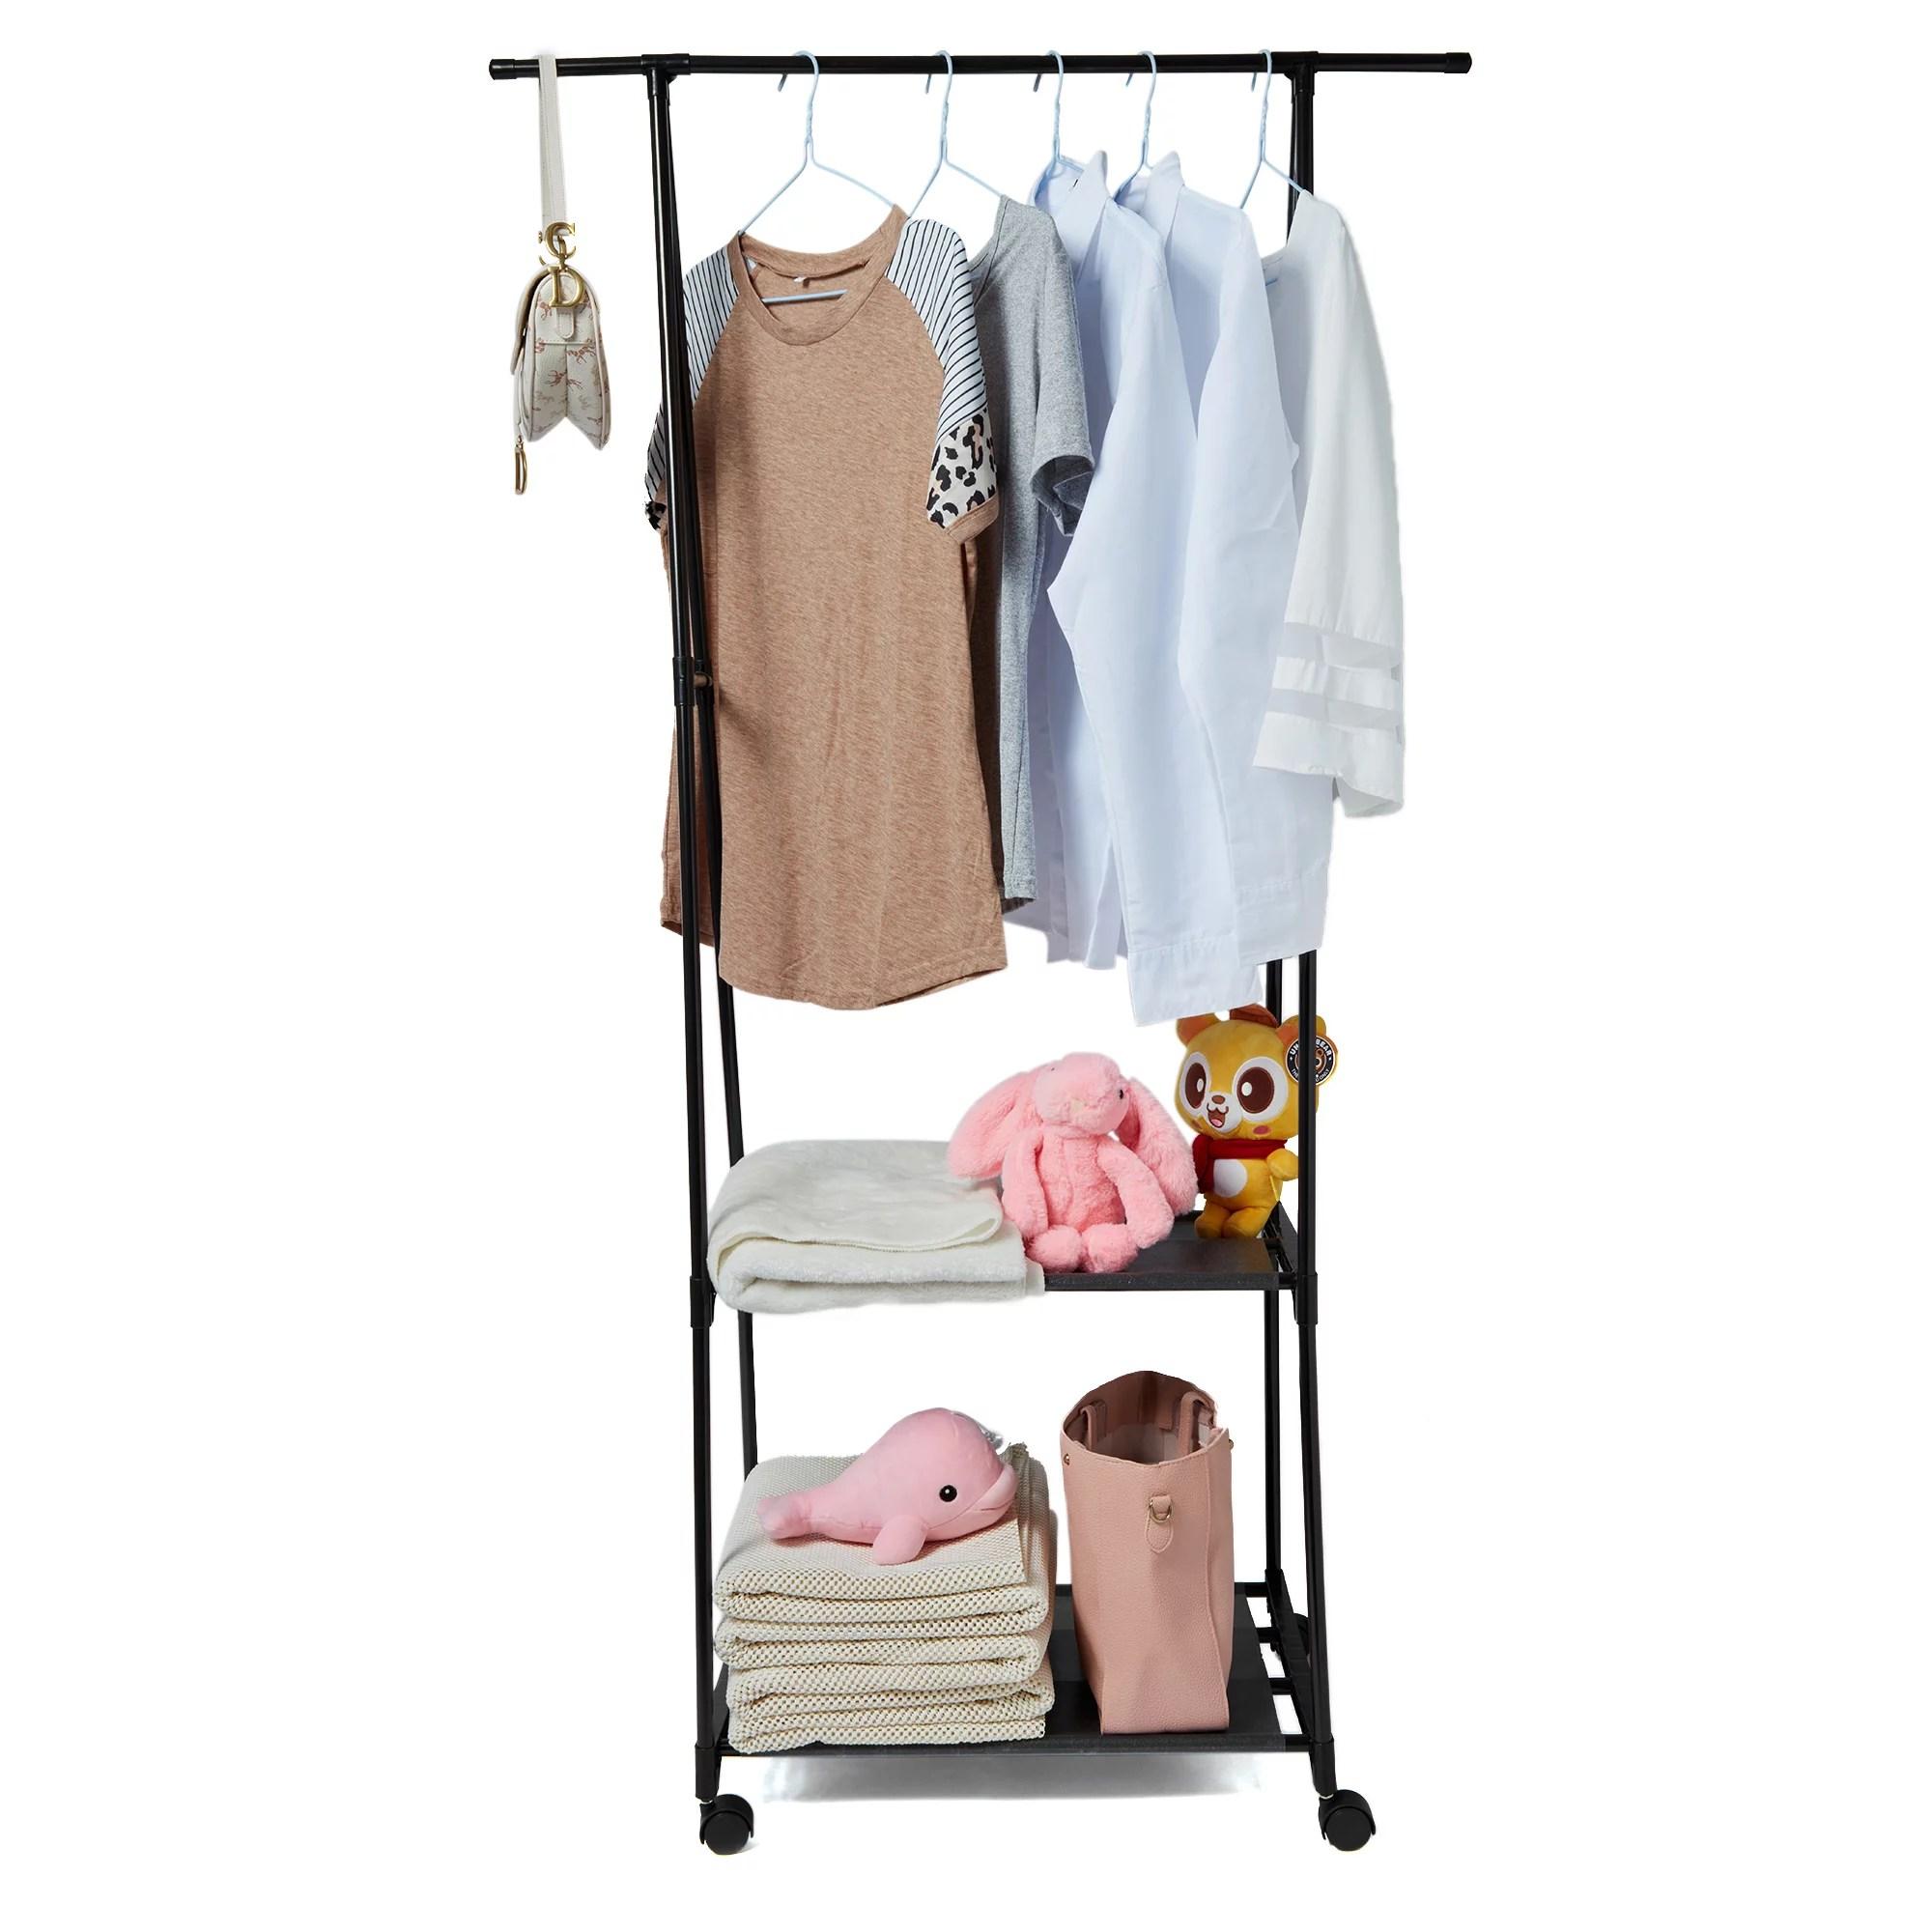 2 tier garment rack triangle coat wheel rack removable clothes hanging hanger clothes storage standing garment rack 160 42 55cm